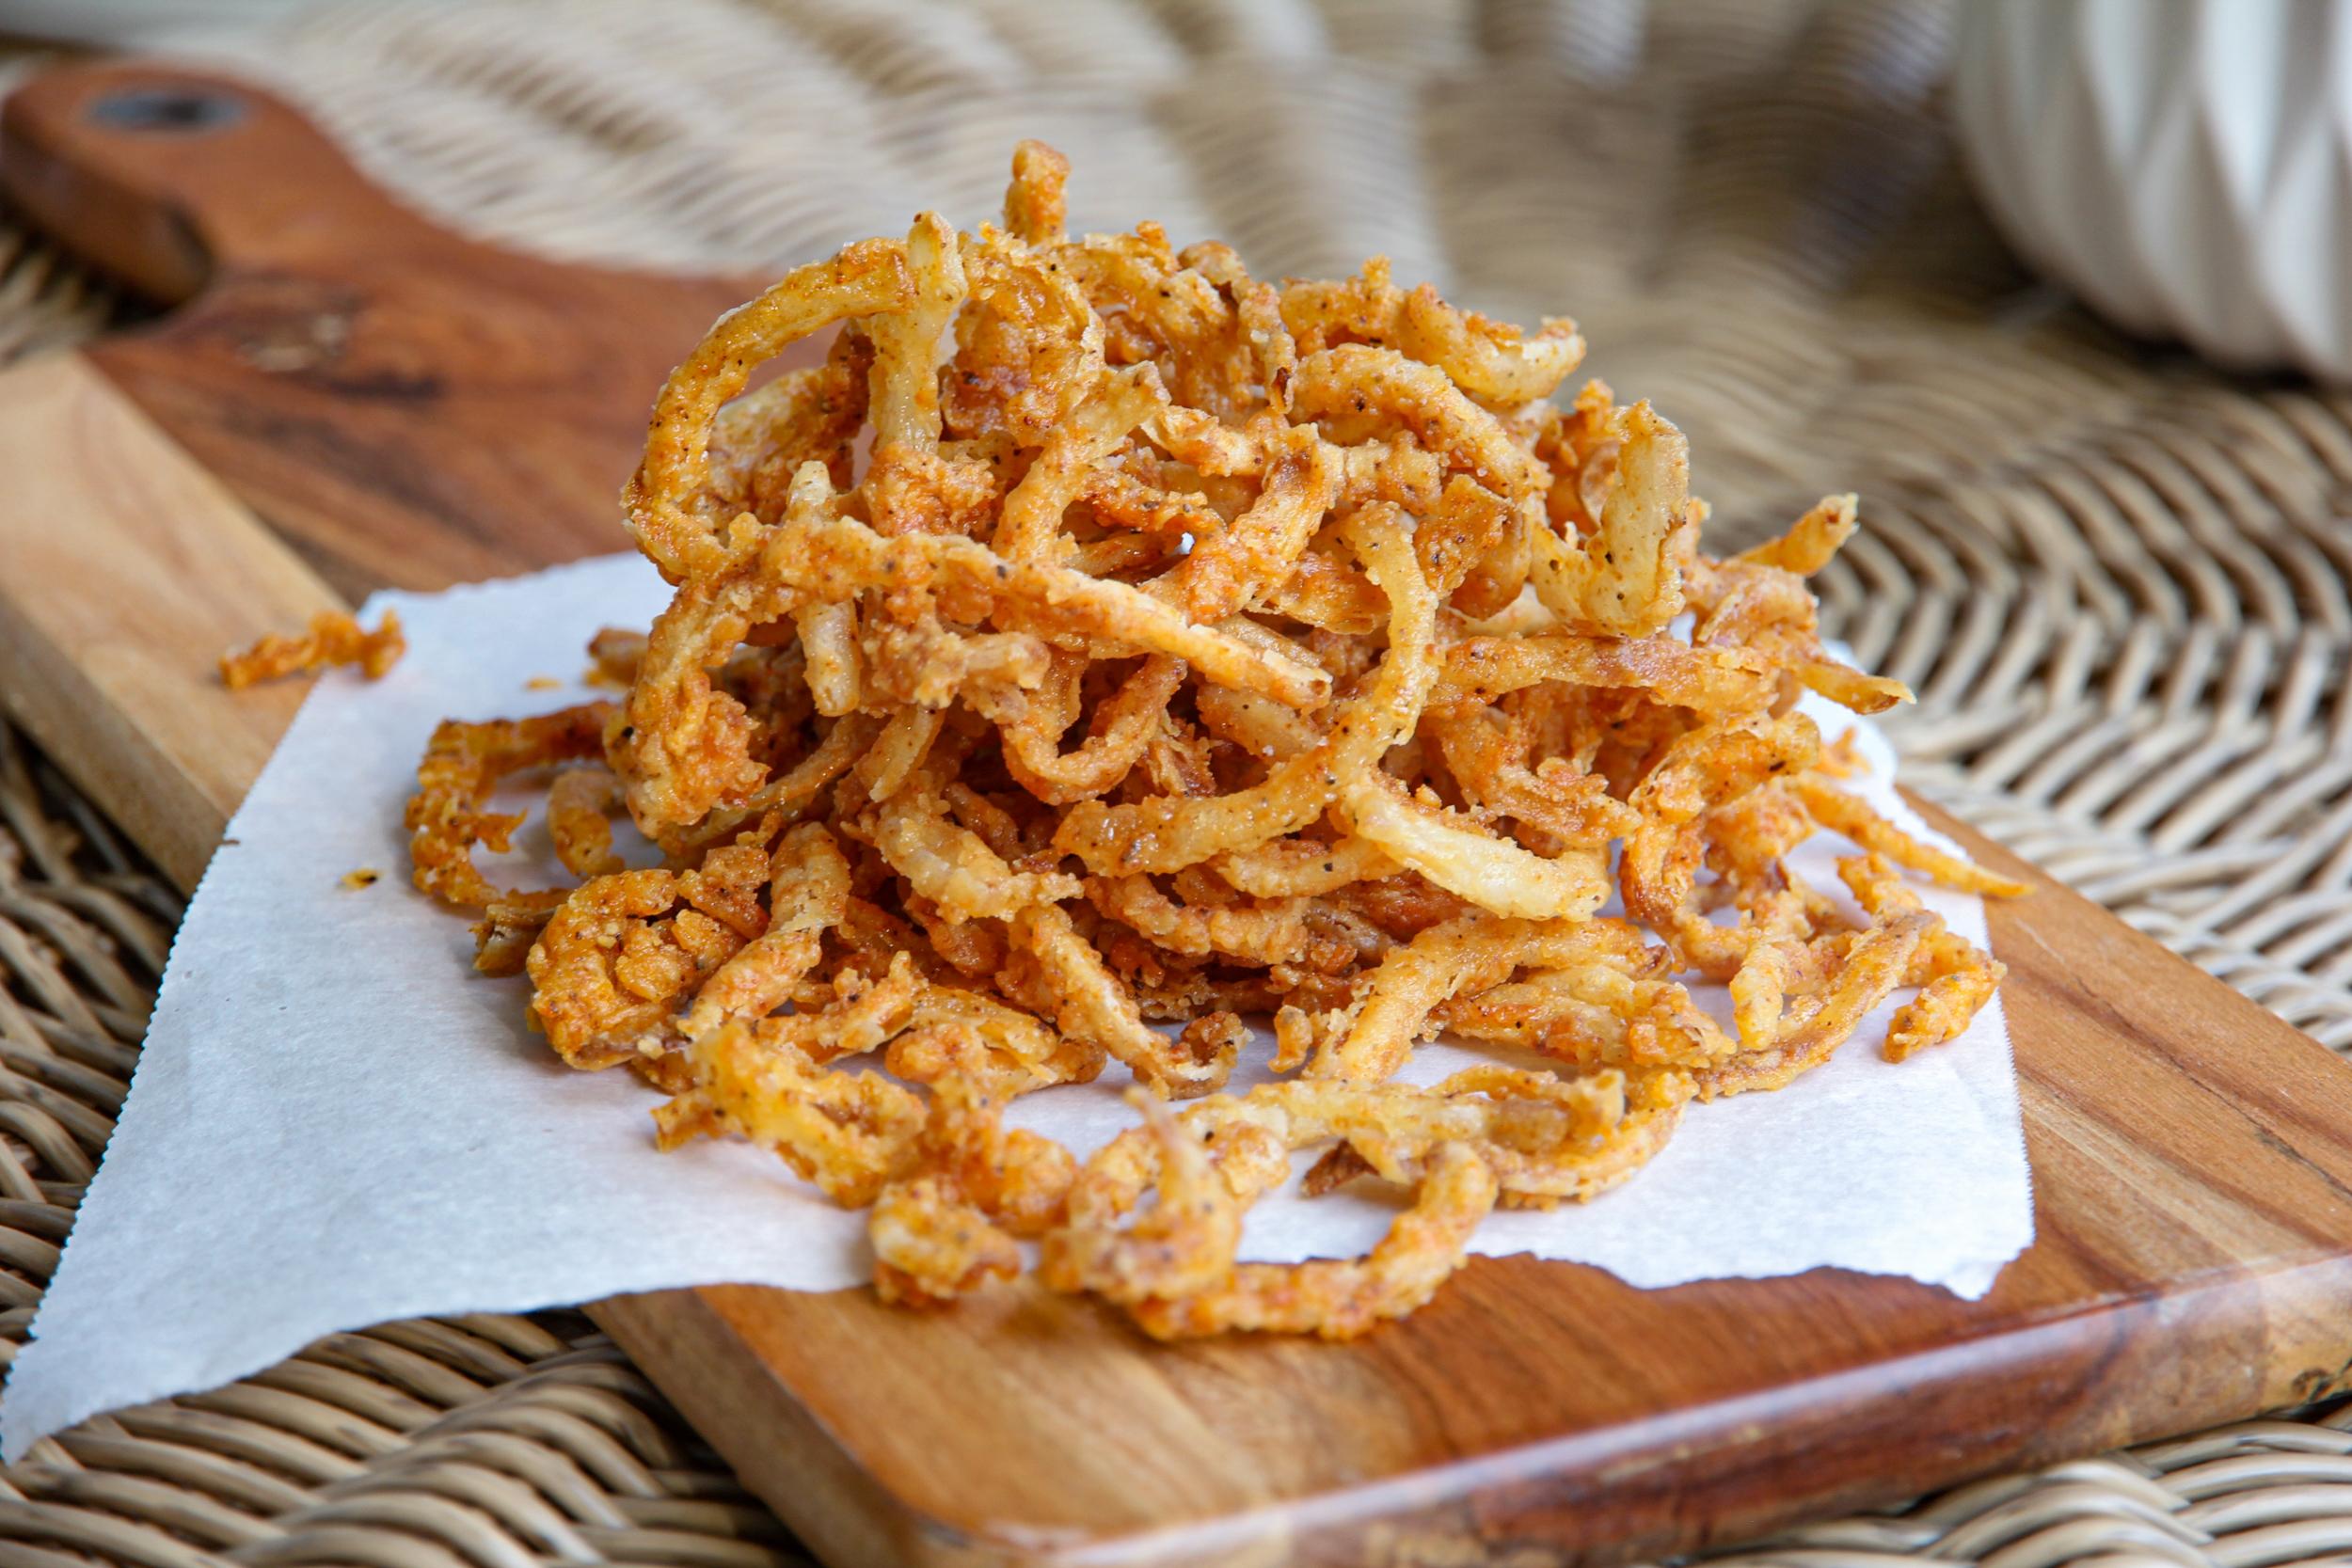 homemade crispy fried onion string recipe